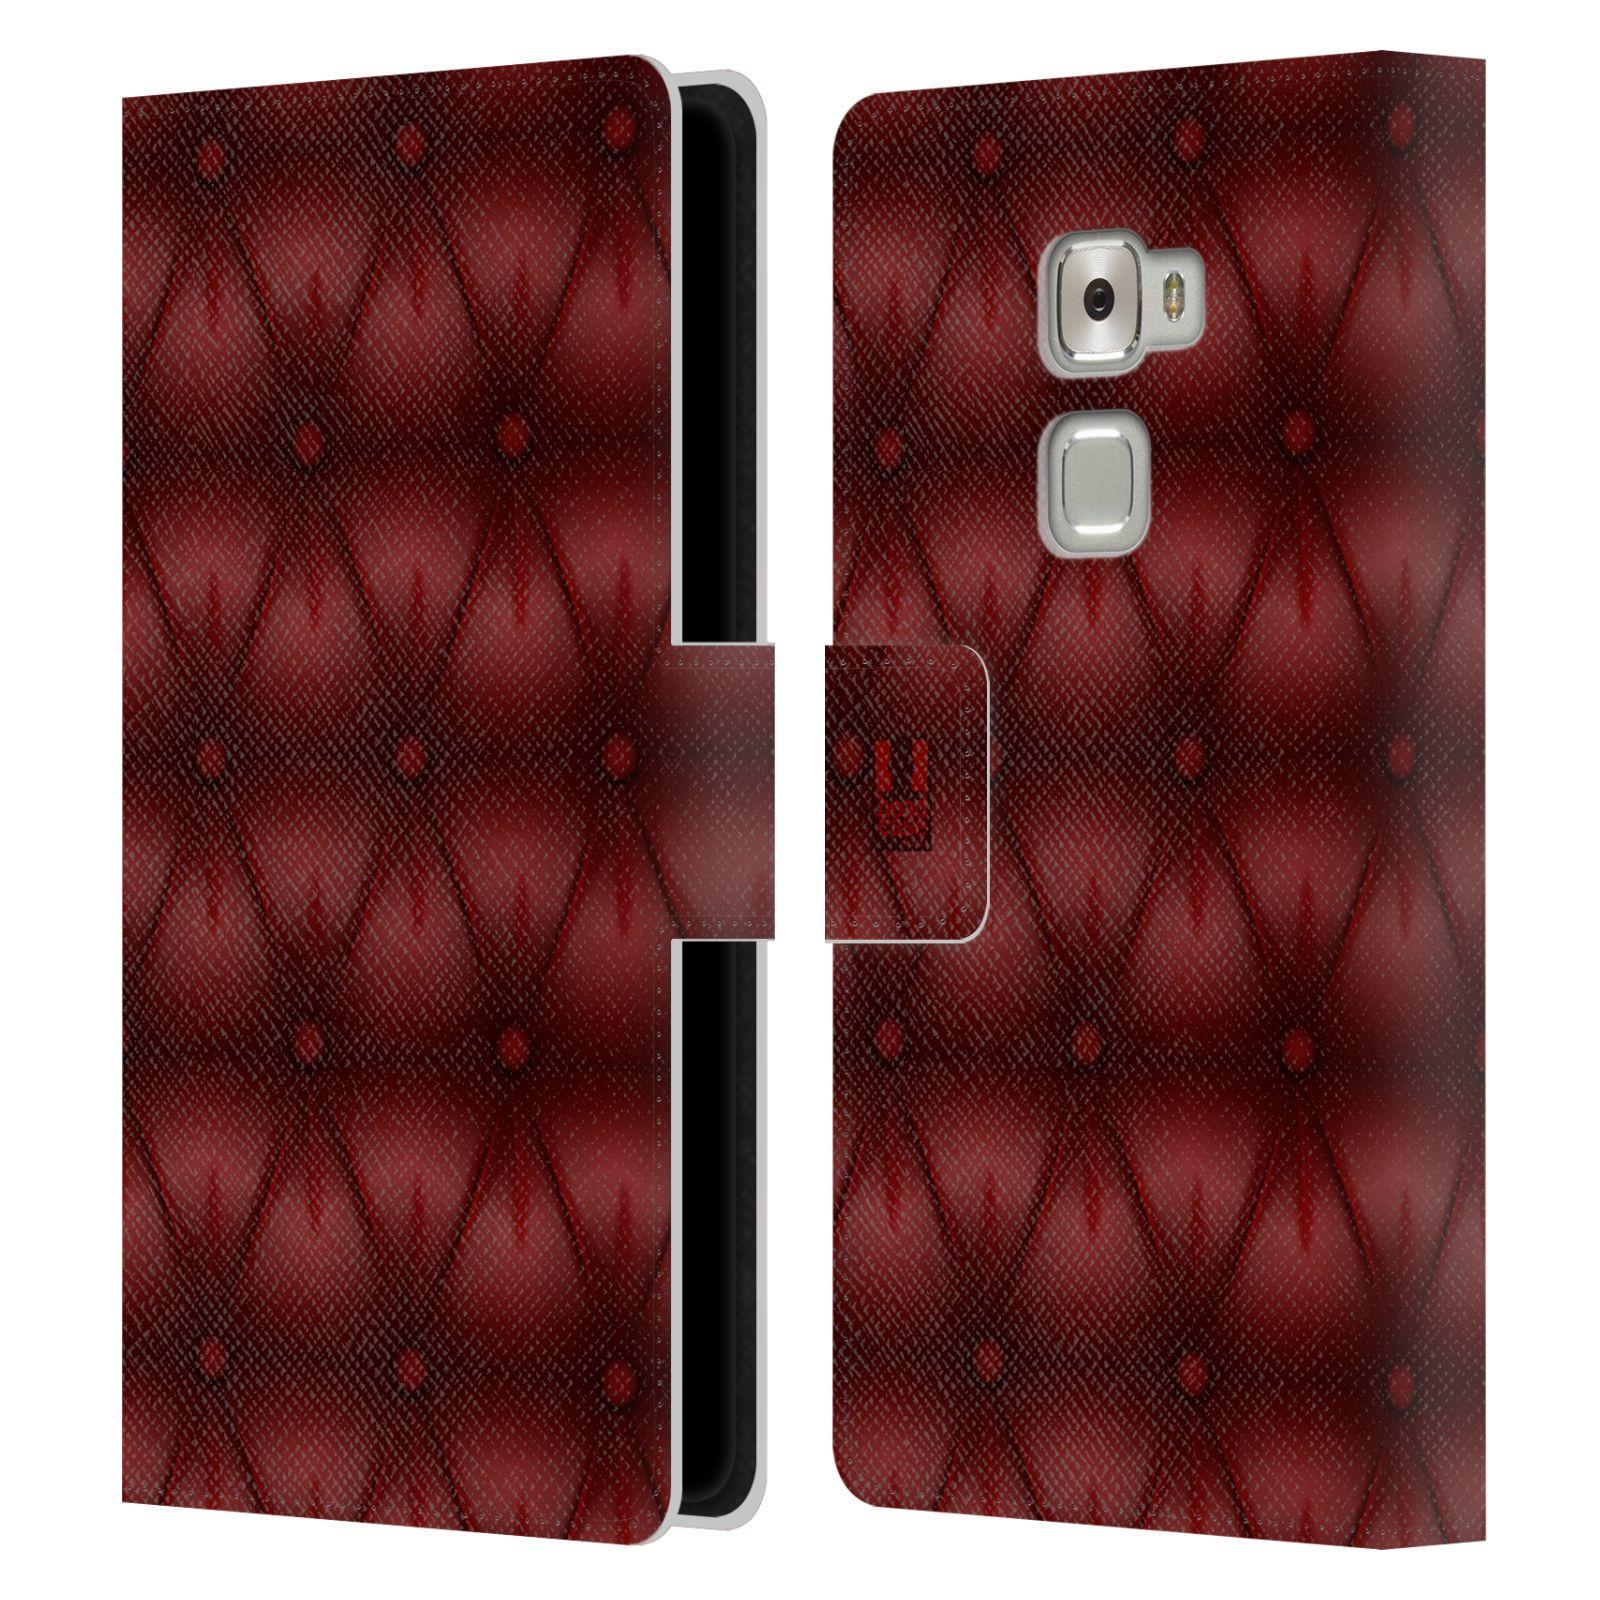 head case designs kissen brieftasche handyh lle aus leder f r huawei mate s ebay. Black Bedroom Furniture Sets. Home Design Ideas